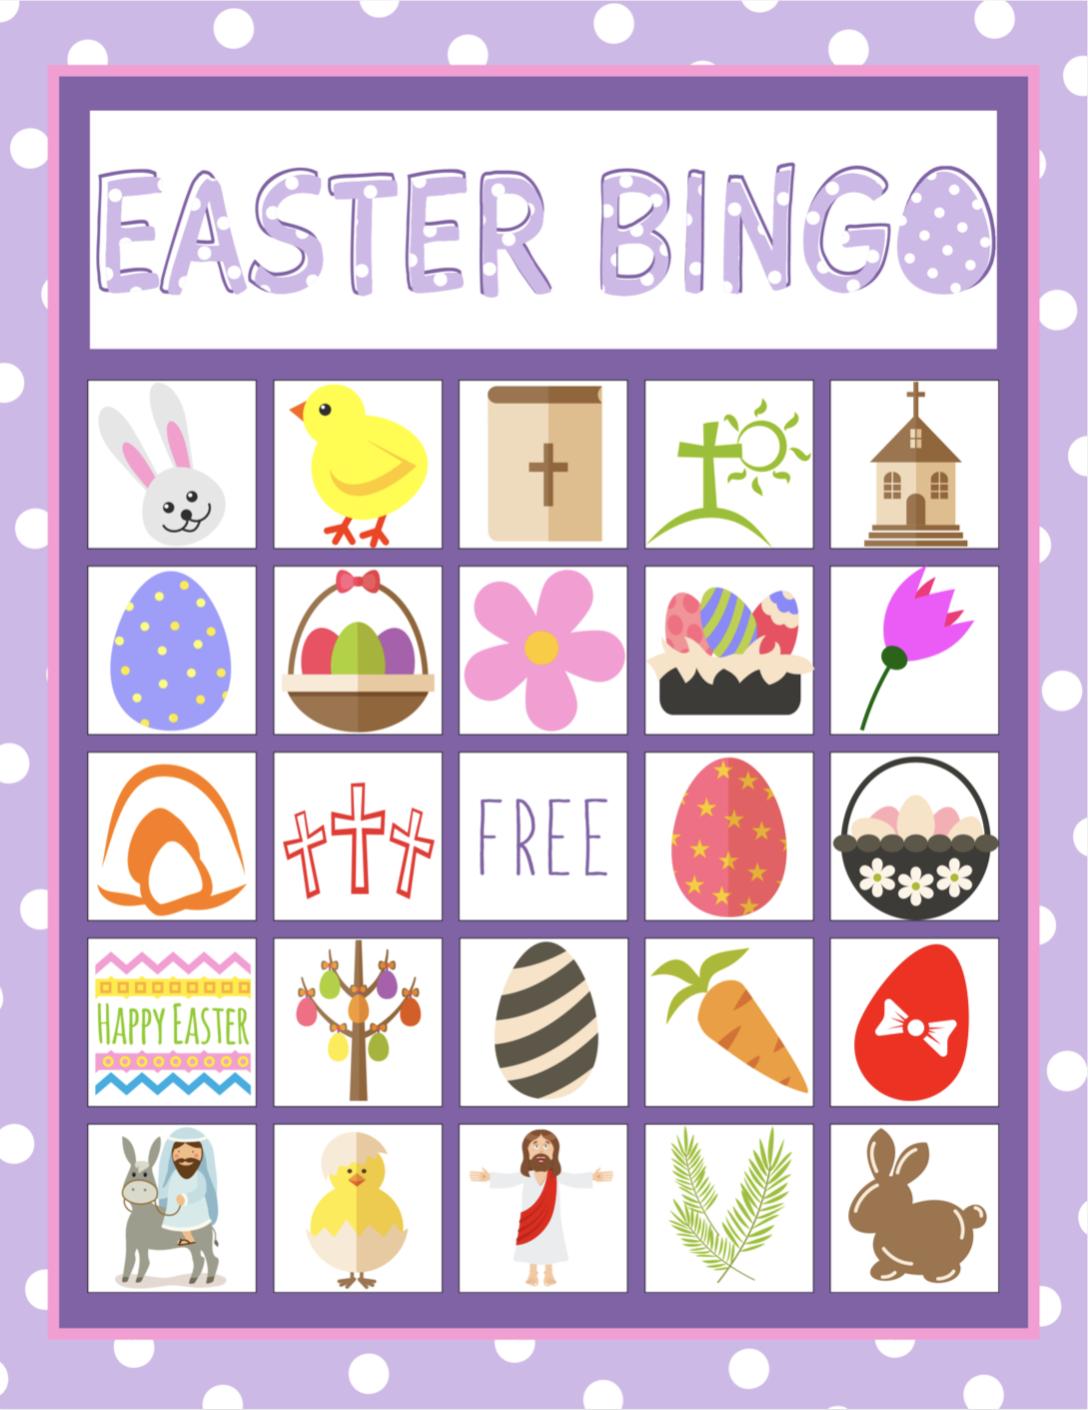 Easter Bingo Game For Kids | Children's Pastor Only | Easter Bingo - Free Printable Religious Easter Bingo Cards